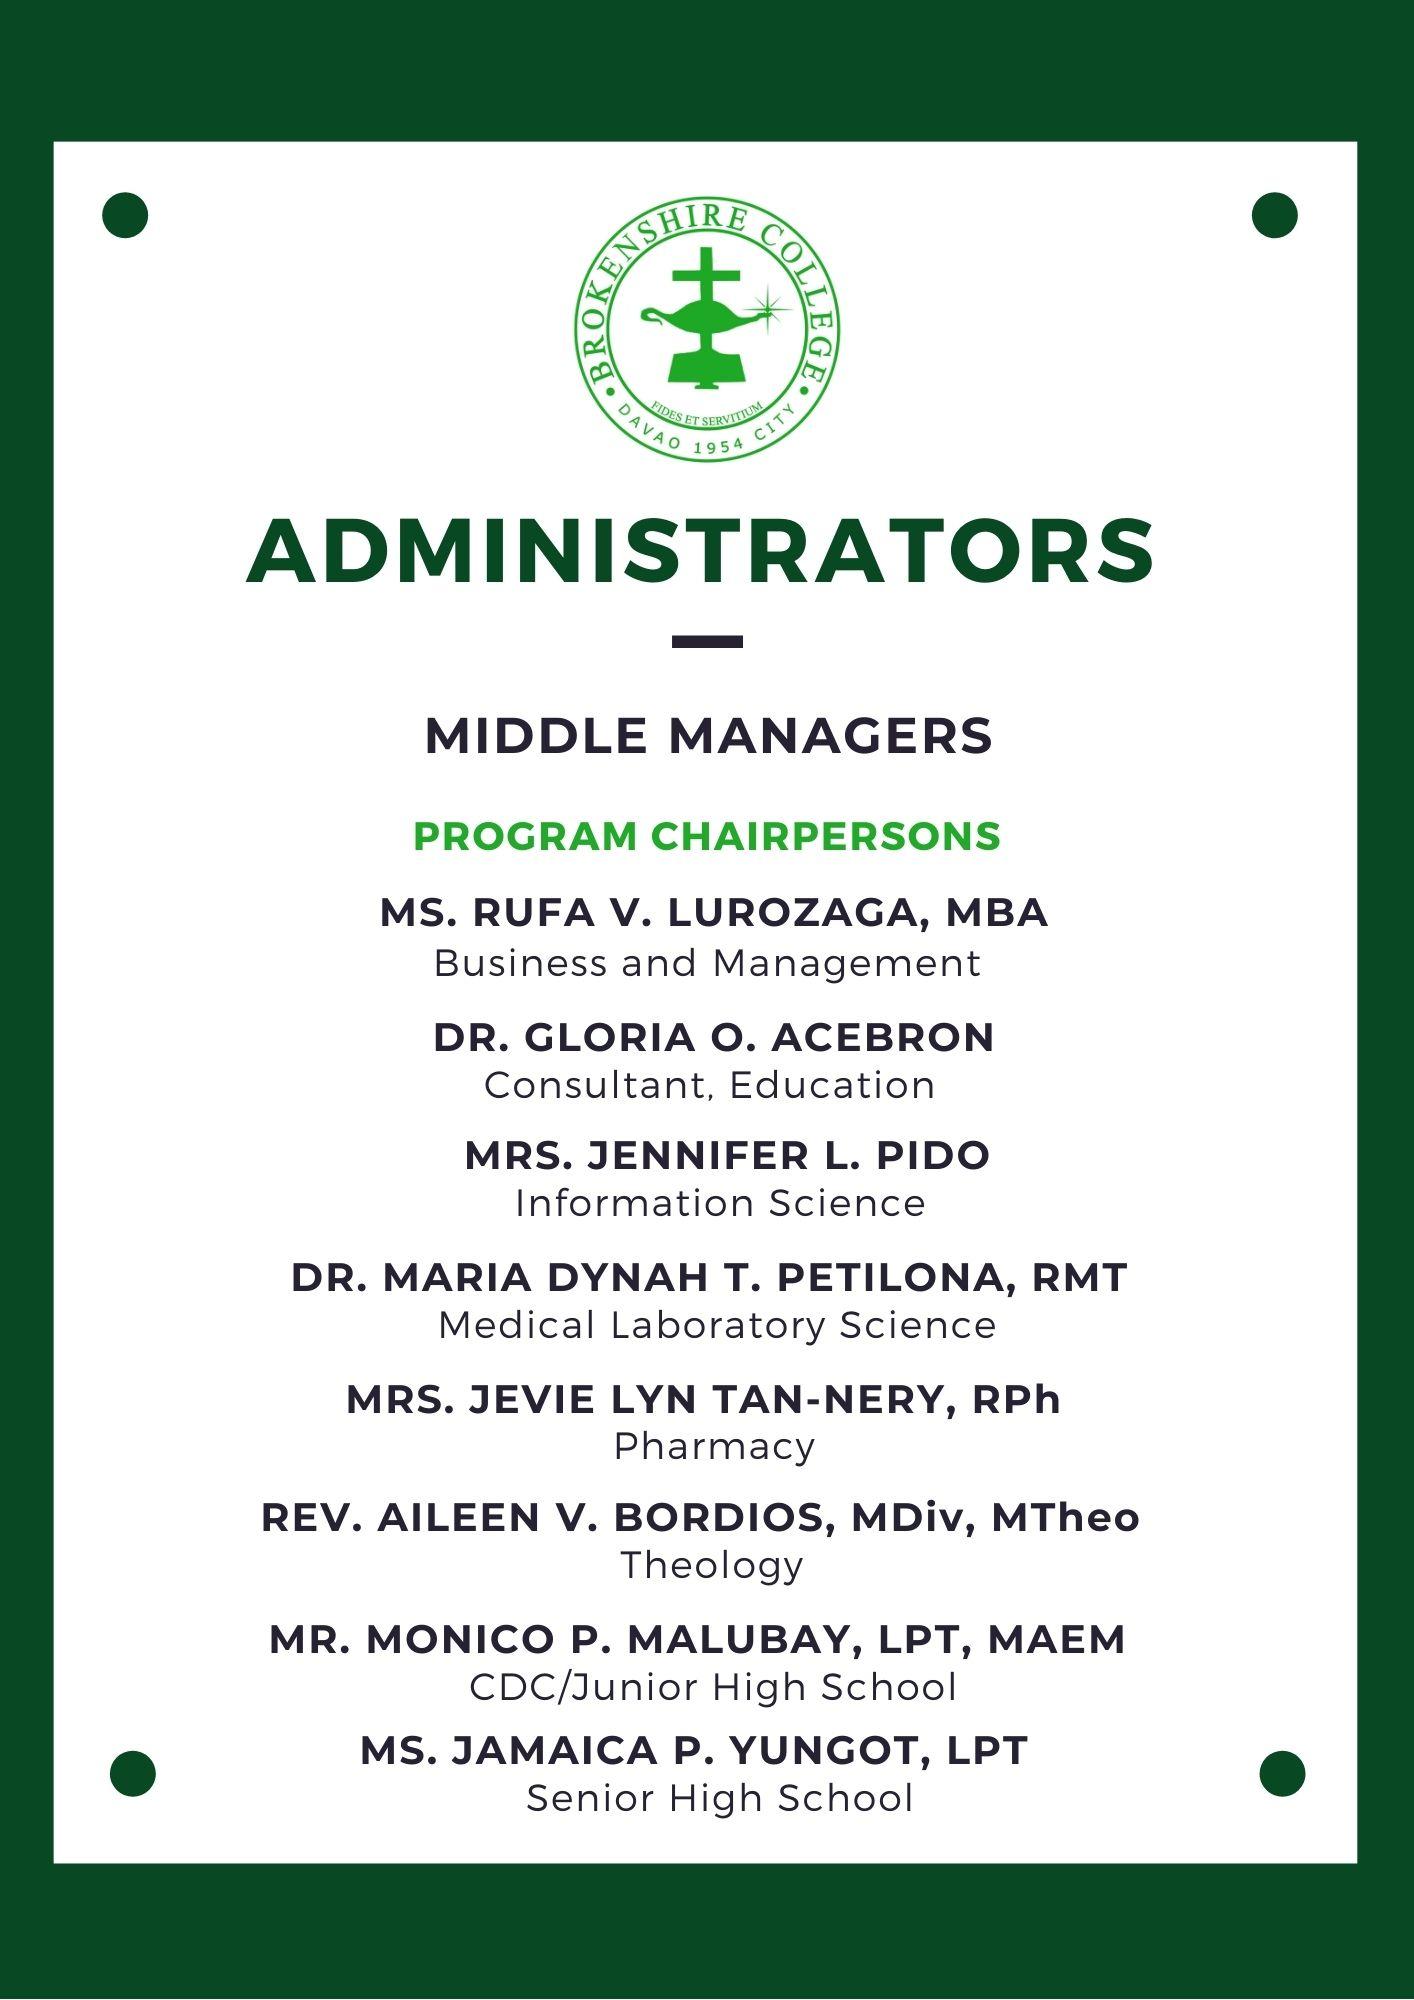 Program Chairperson